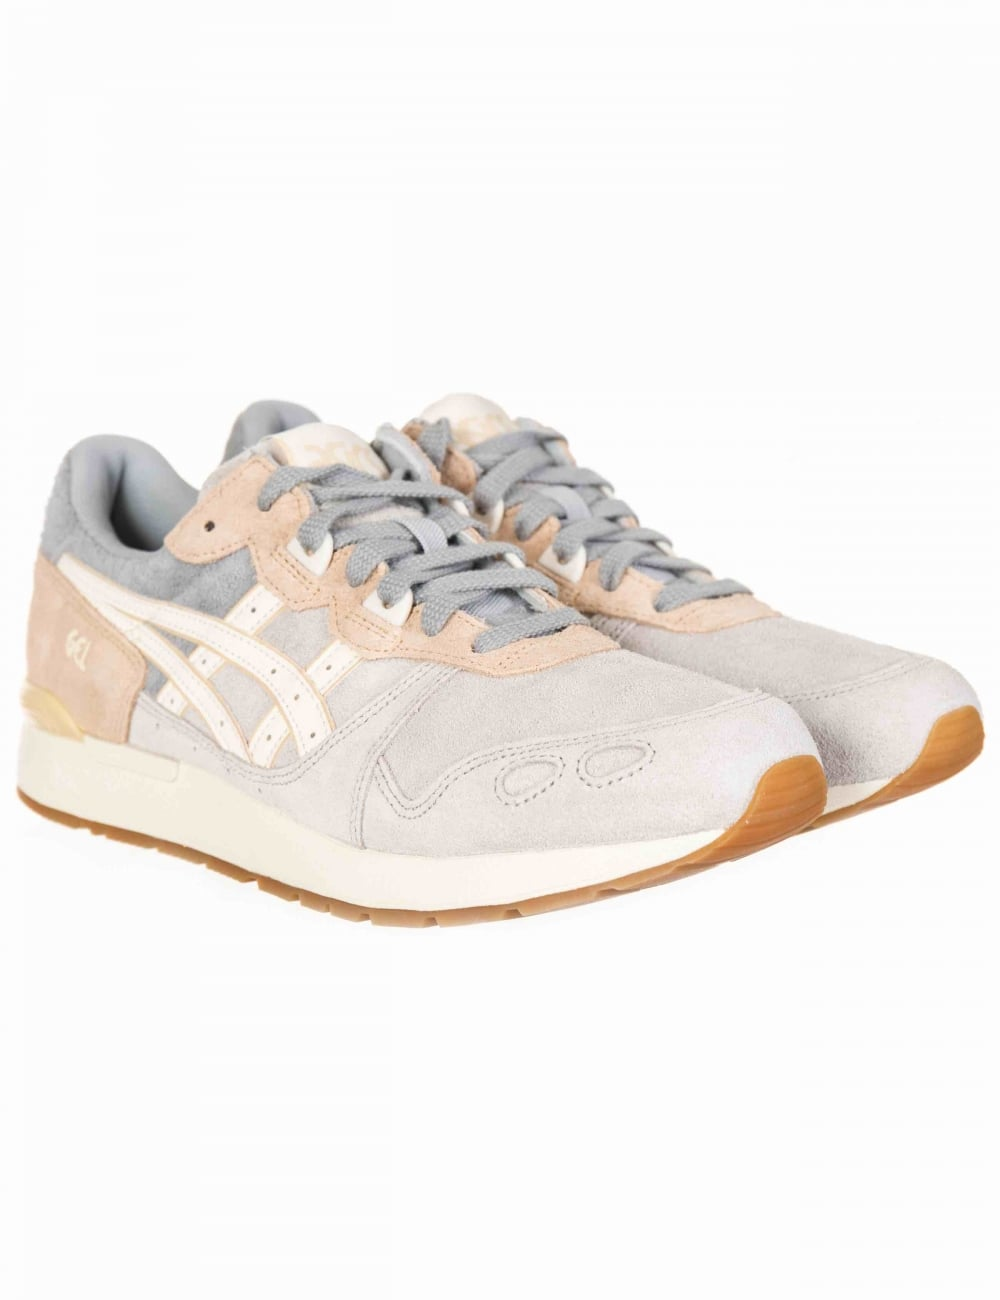 online retailer 3e445 882bc Gel Lyte Shoes - Glacier Grey Cream